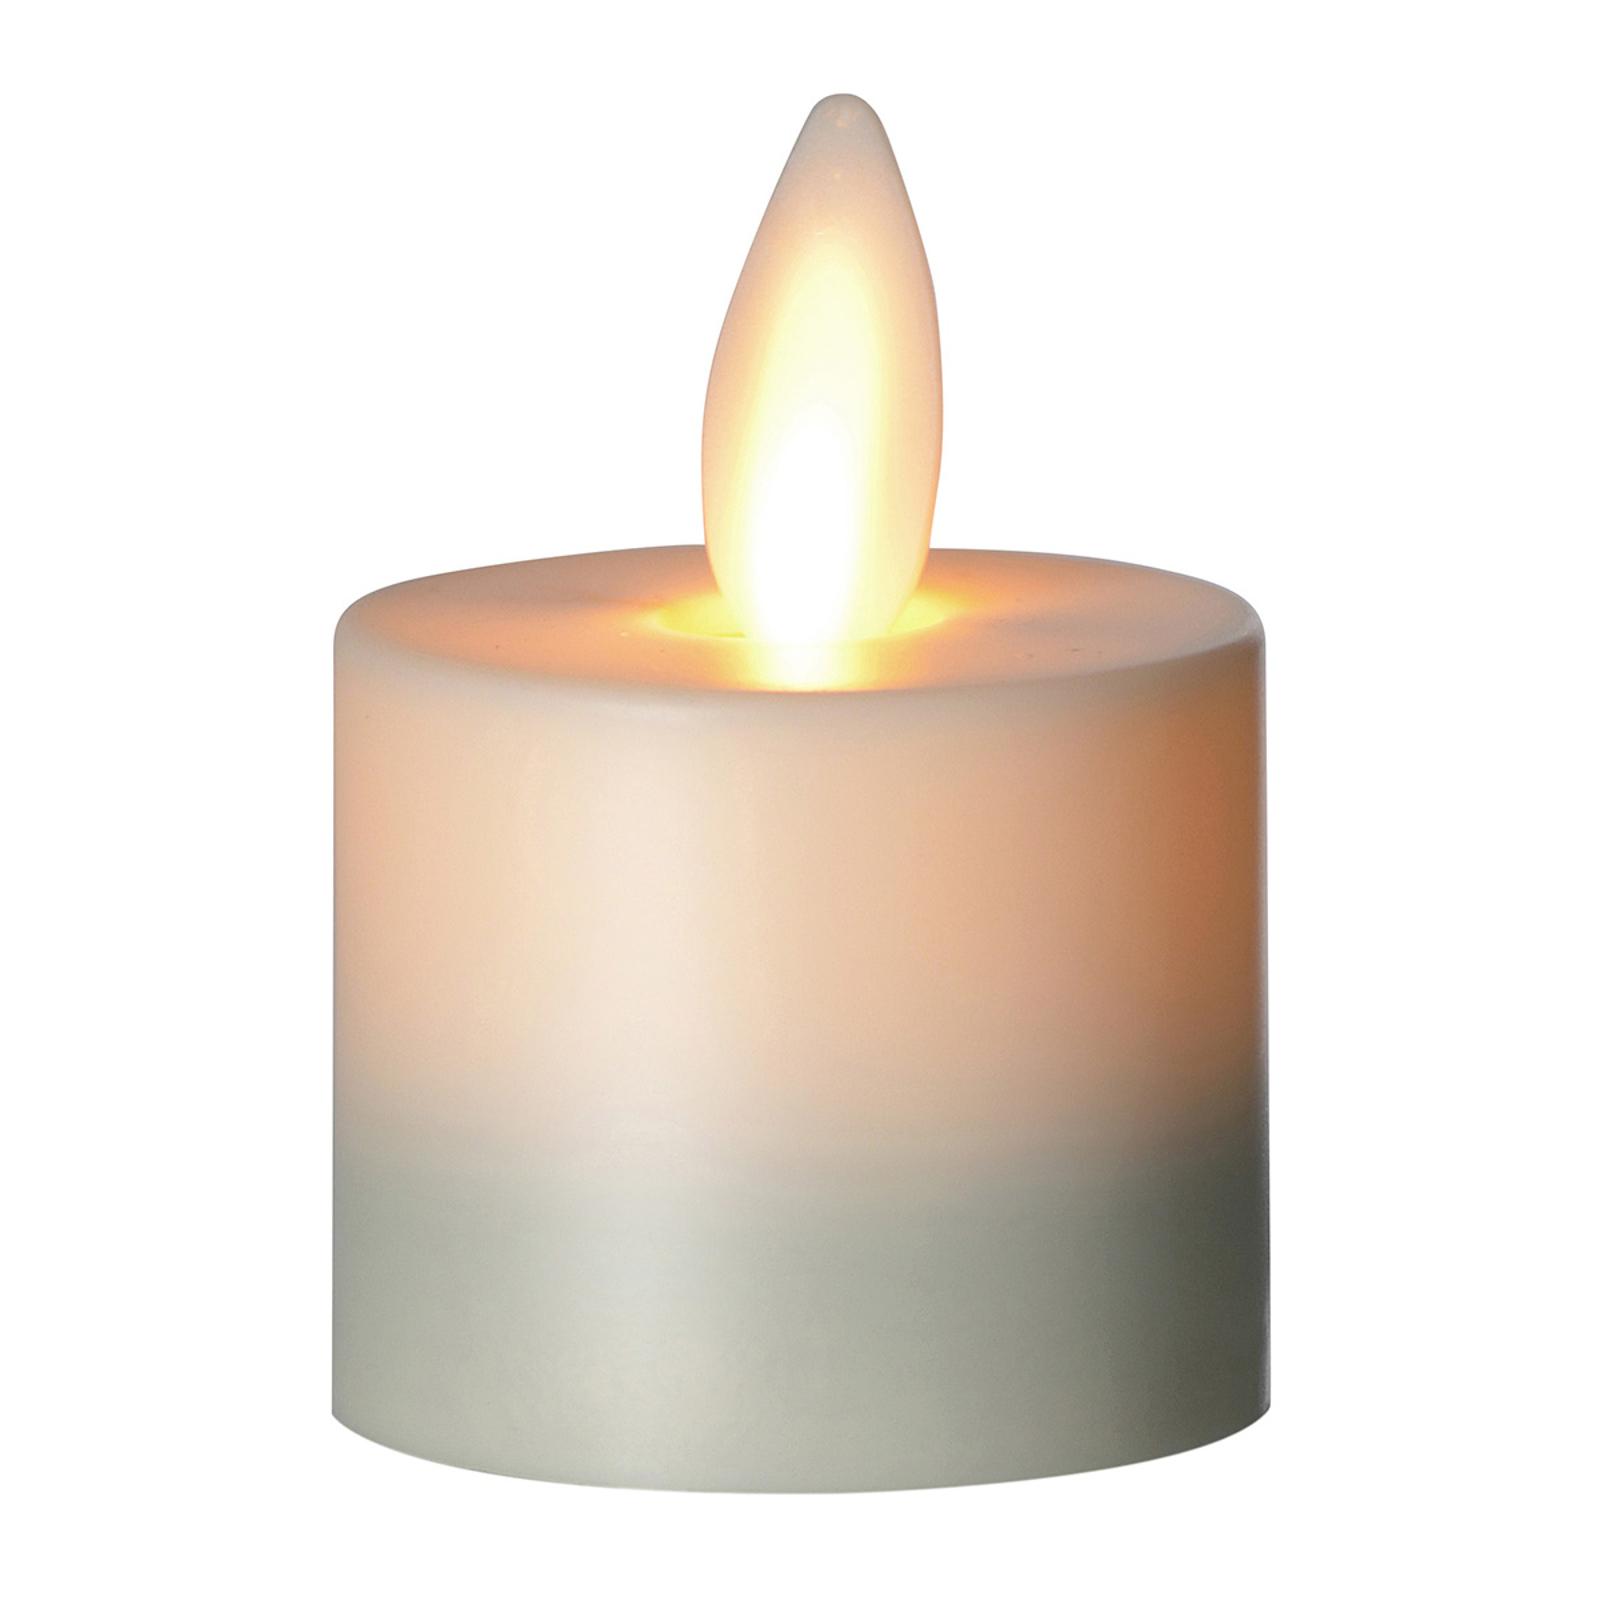 LED kaars Flame Teelicht 3,1 cm